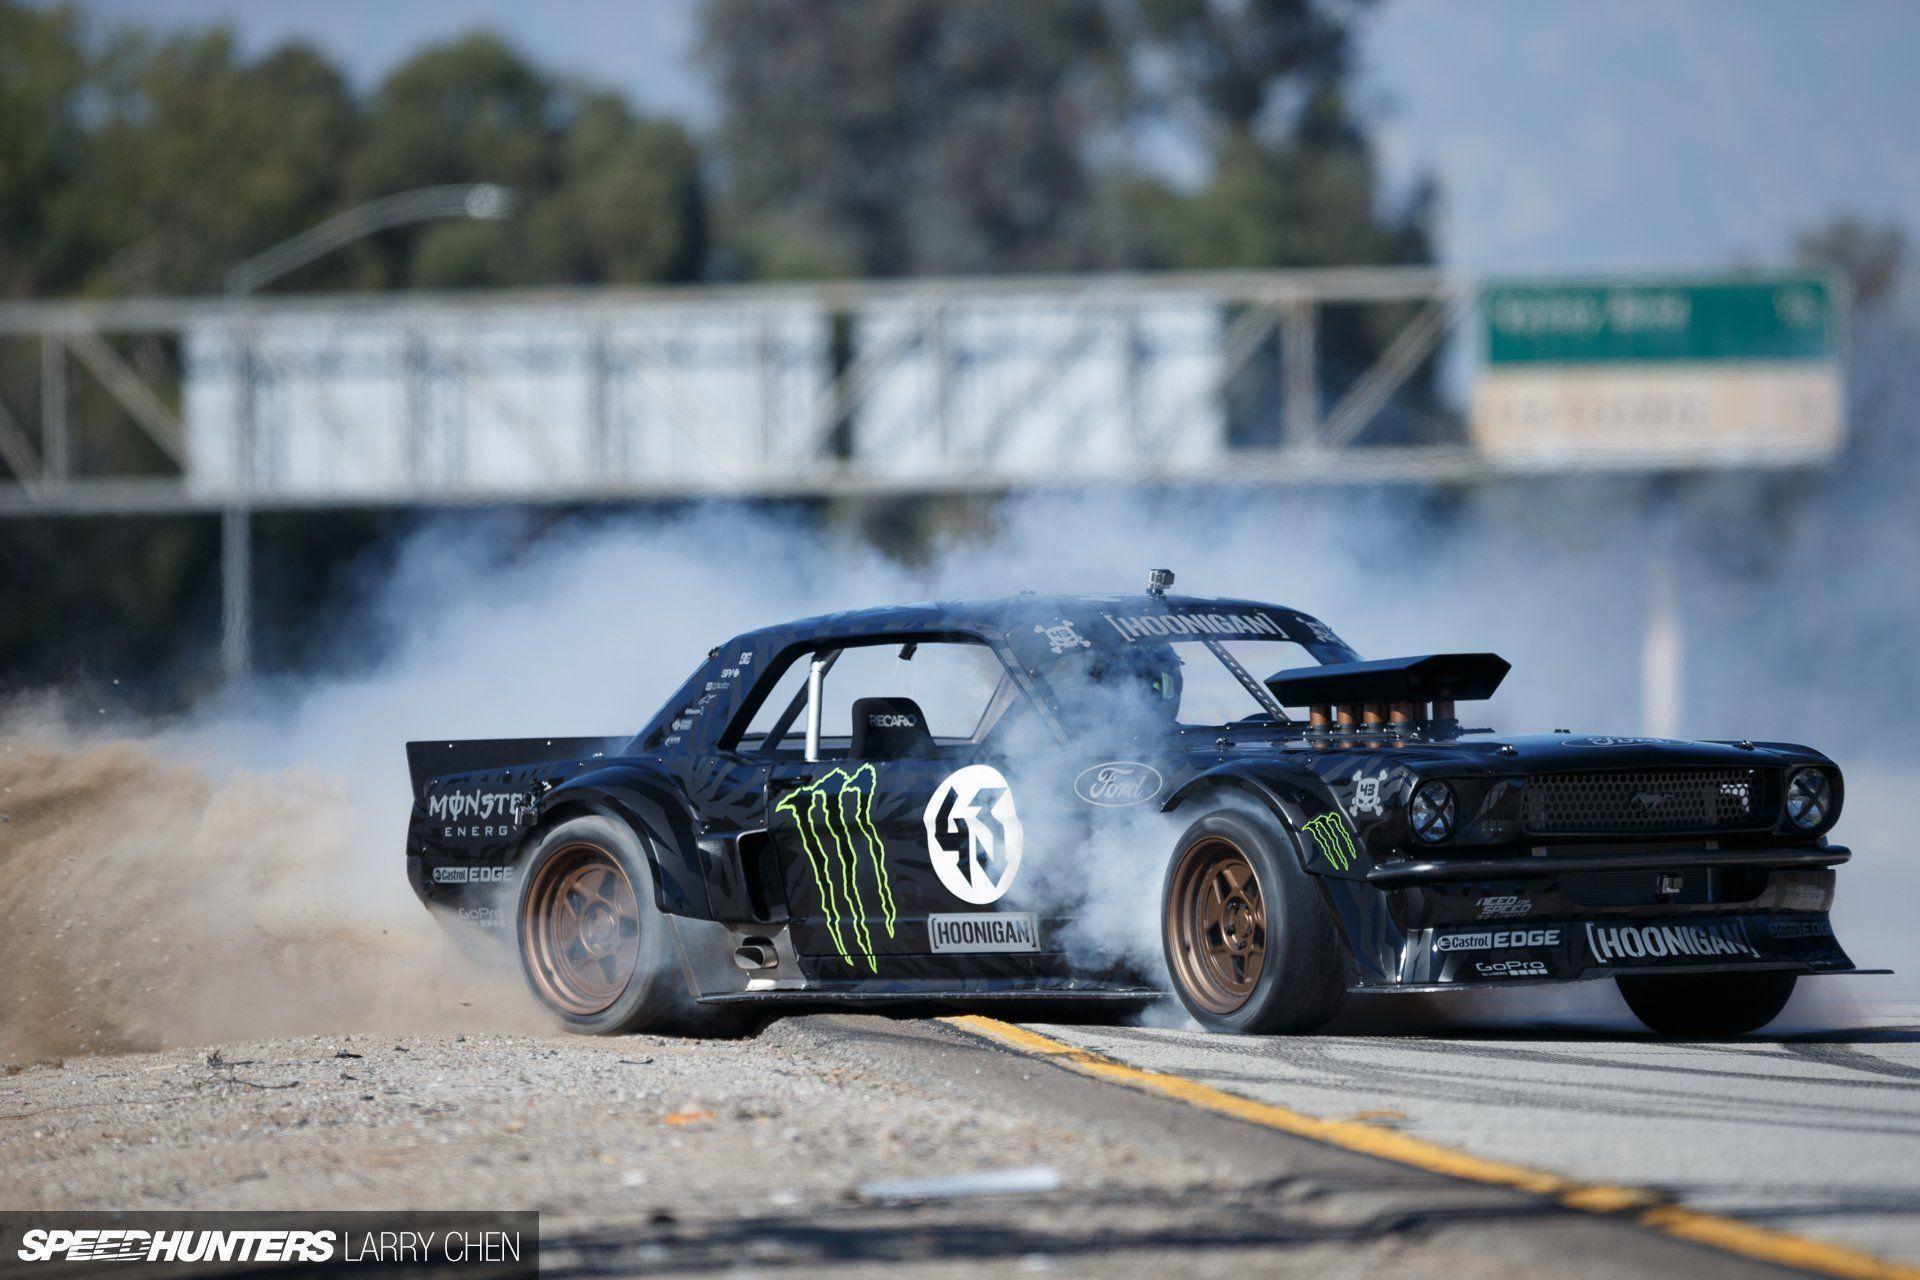 Hoonigan Ford Mustang Top Speed